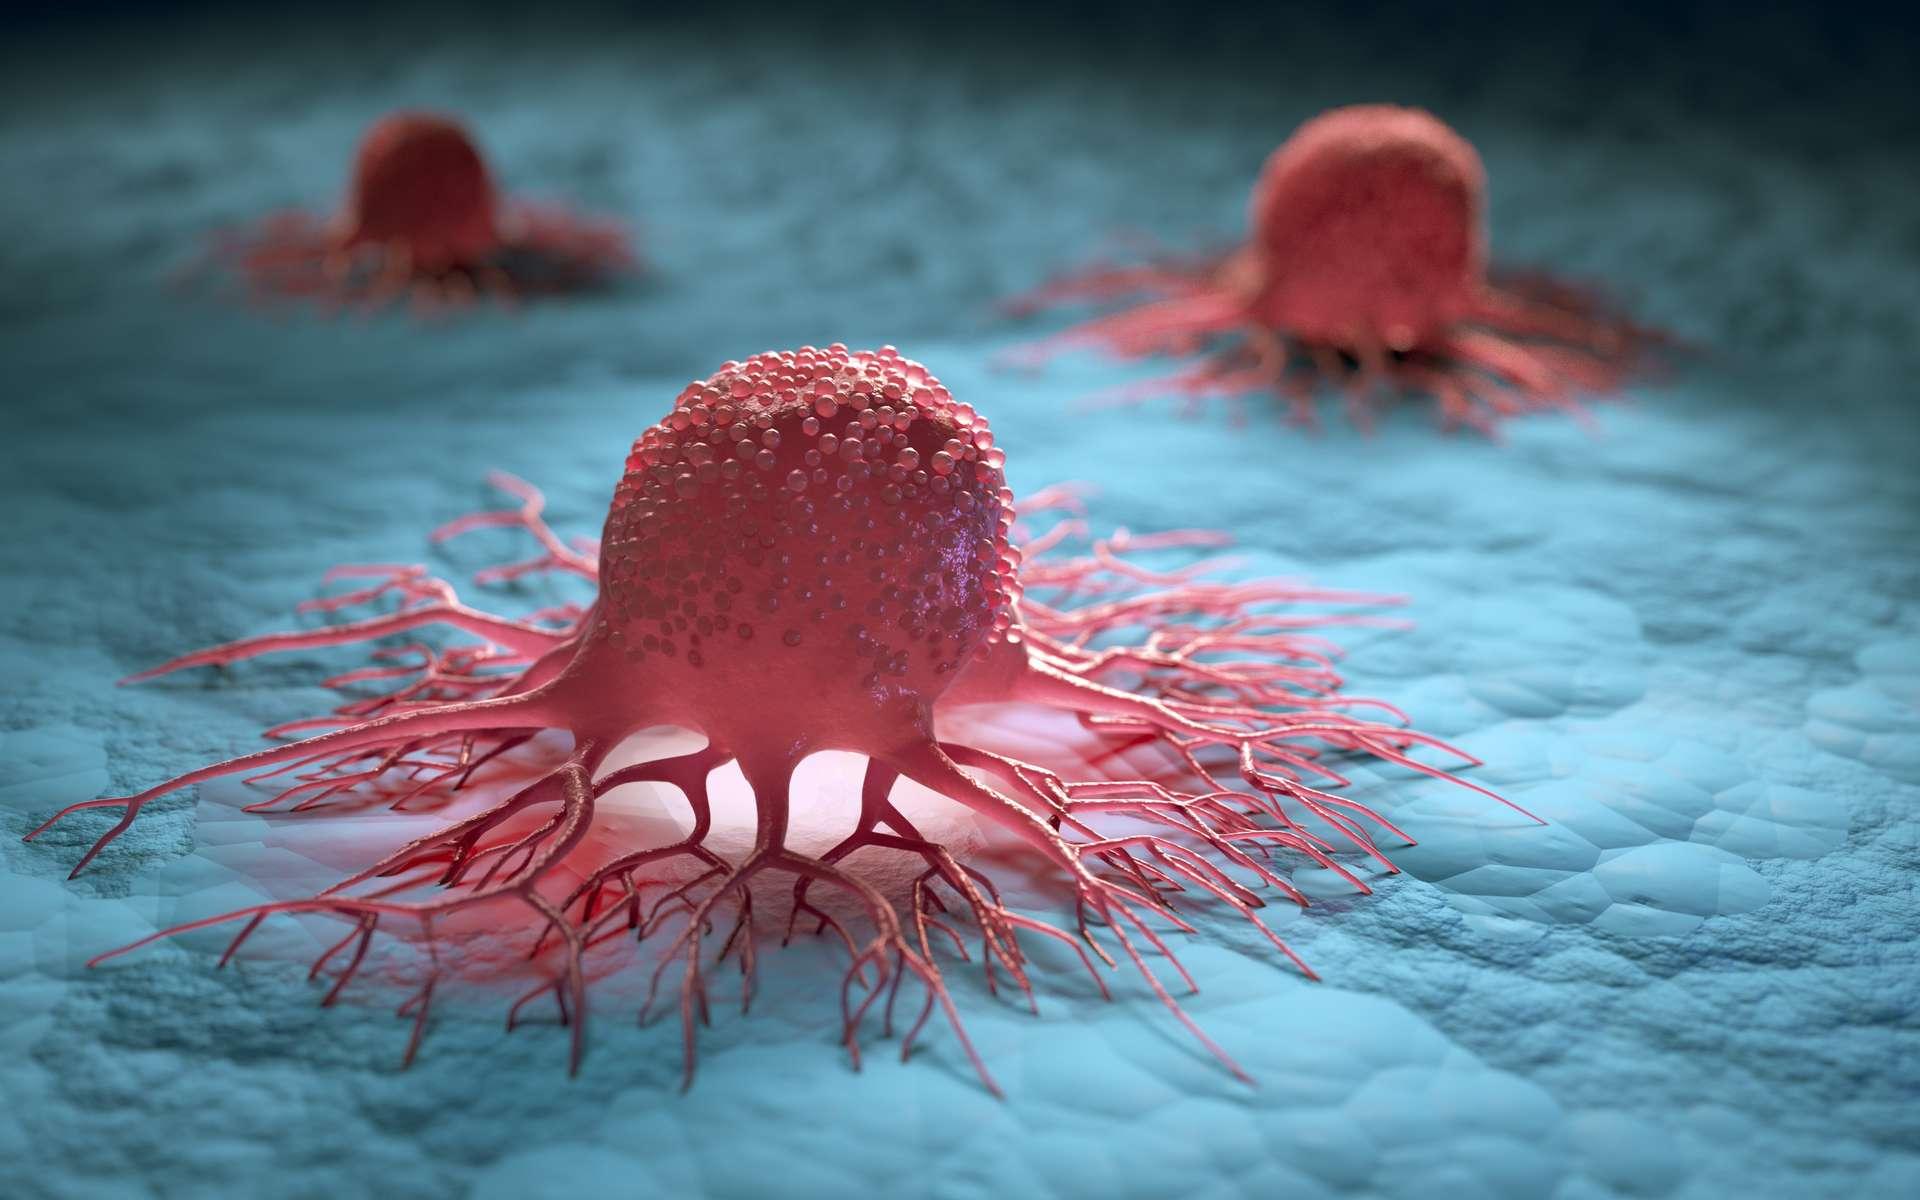 Illustration de cellules cancéreuses isolées. © Peterschreiber.media, Adobe stock